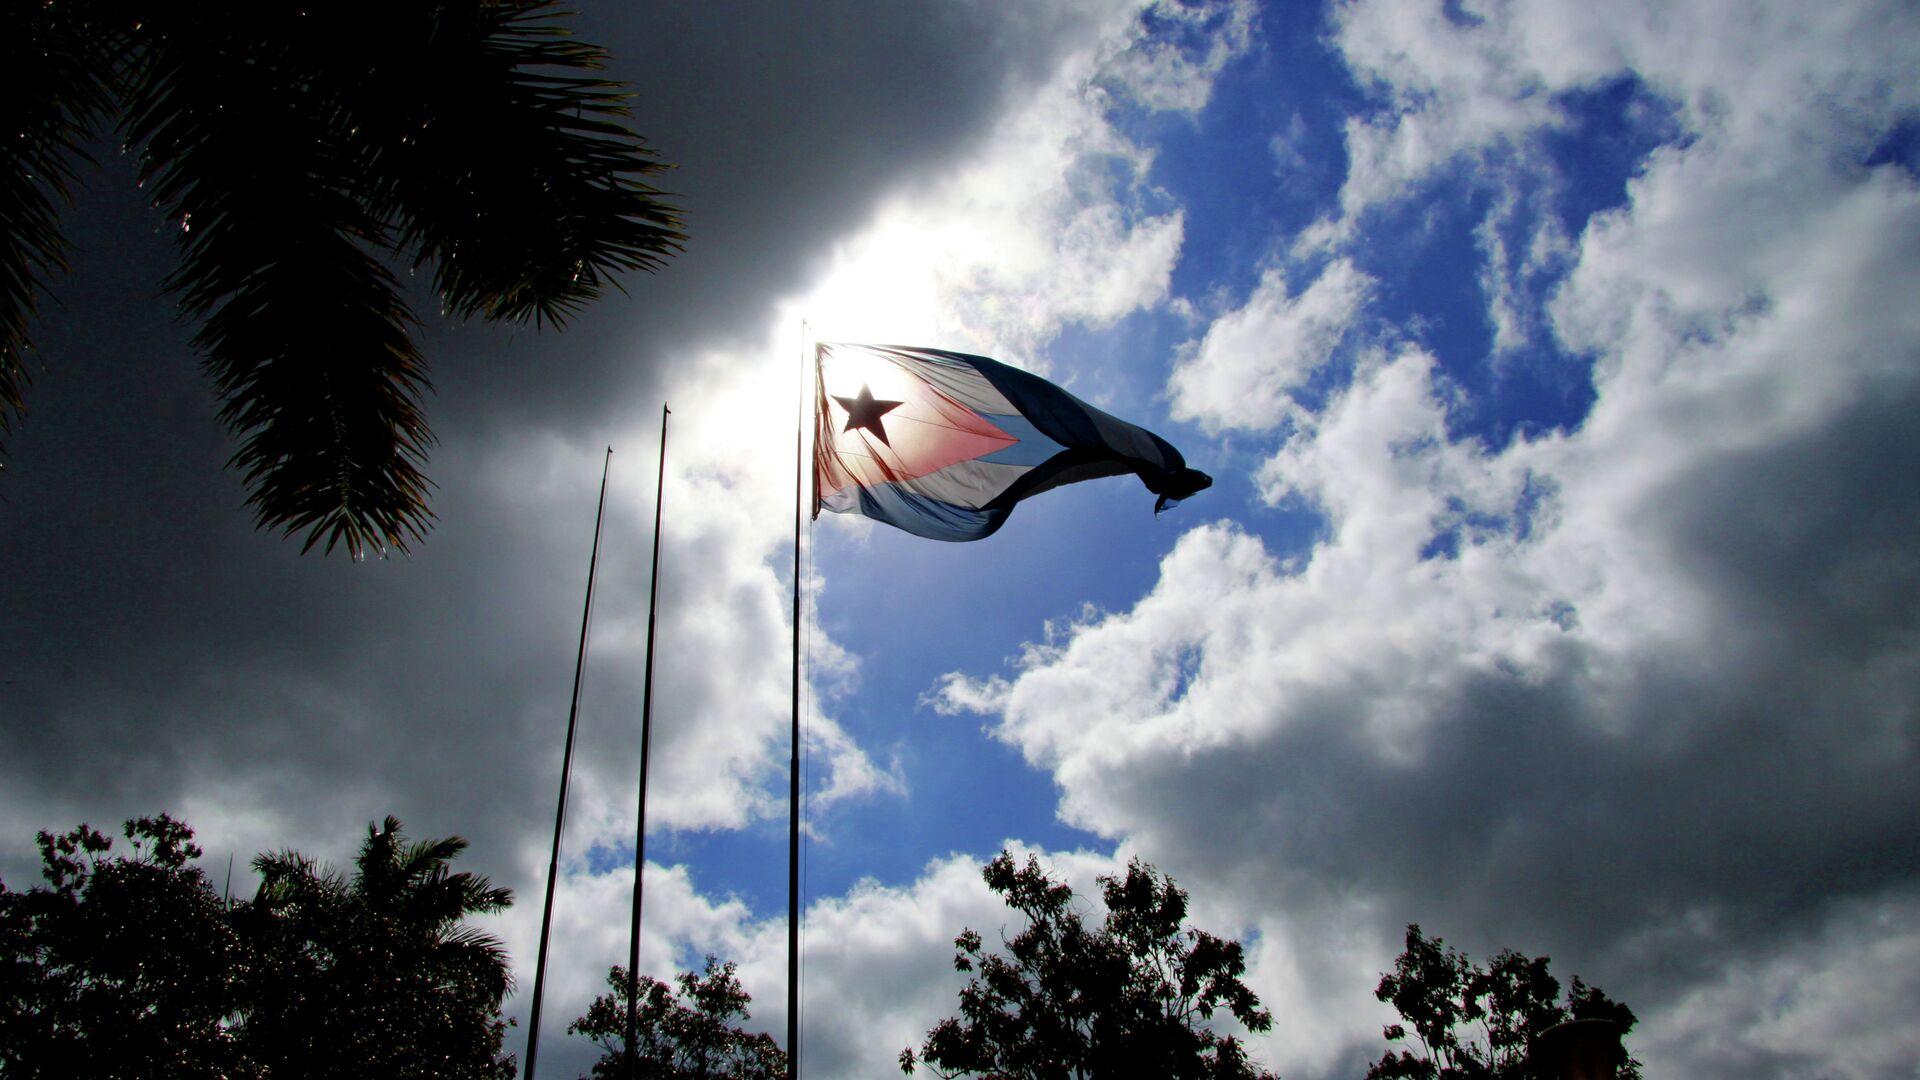 La bandera de Cuba - Sputnik Mundo, 1920, 31.07.2021